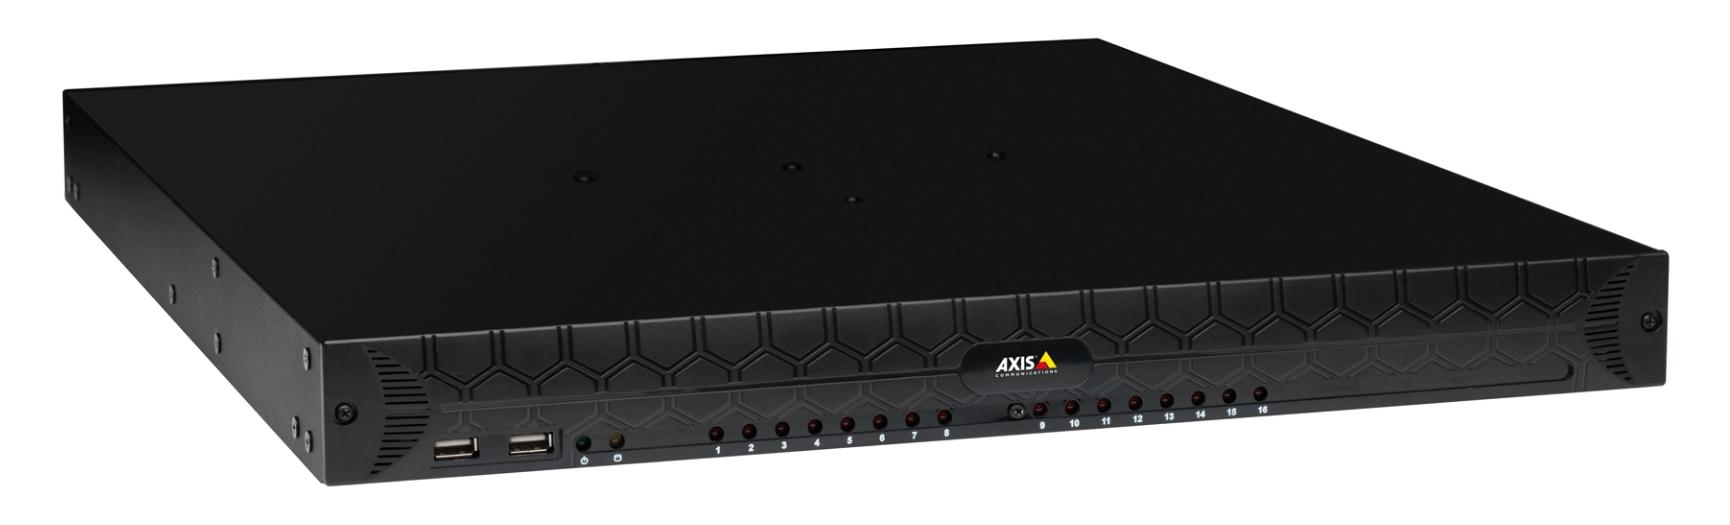 S2016 Rack Server